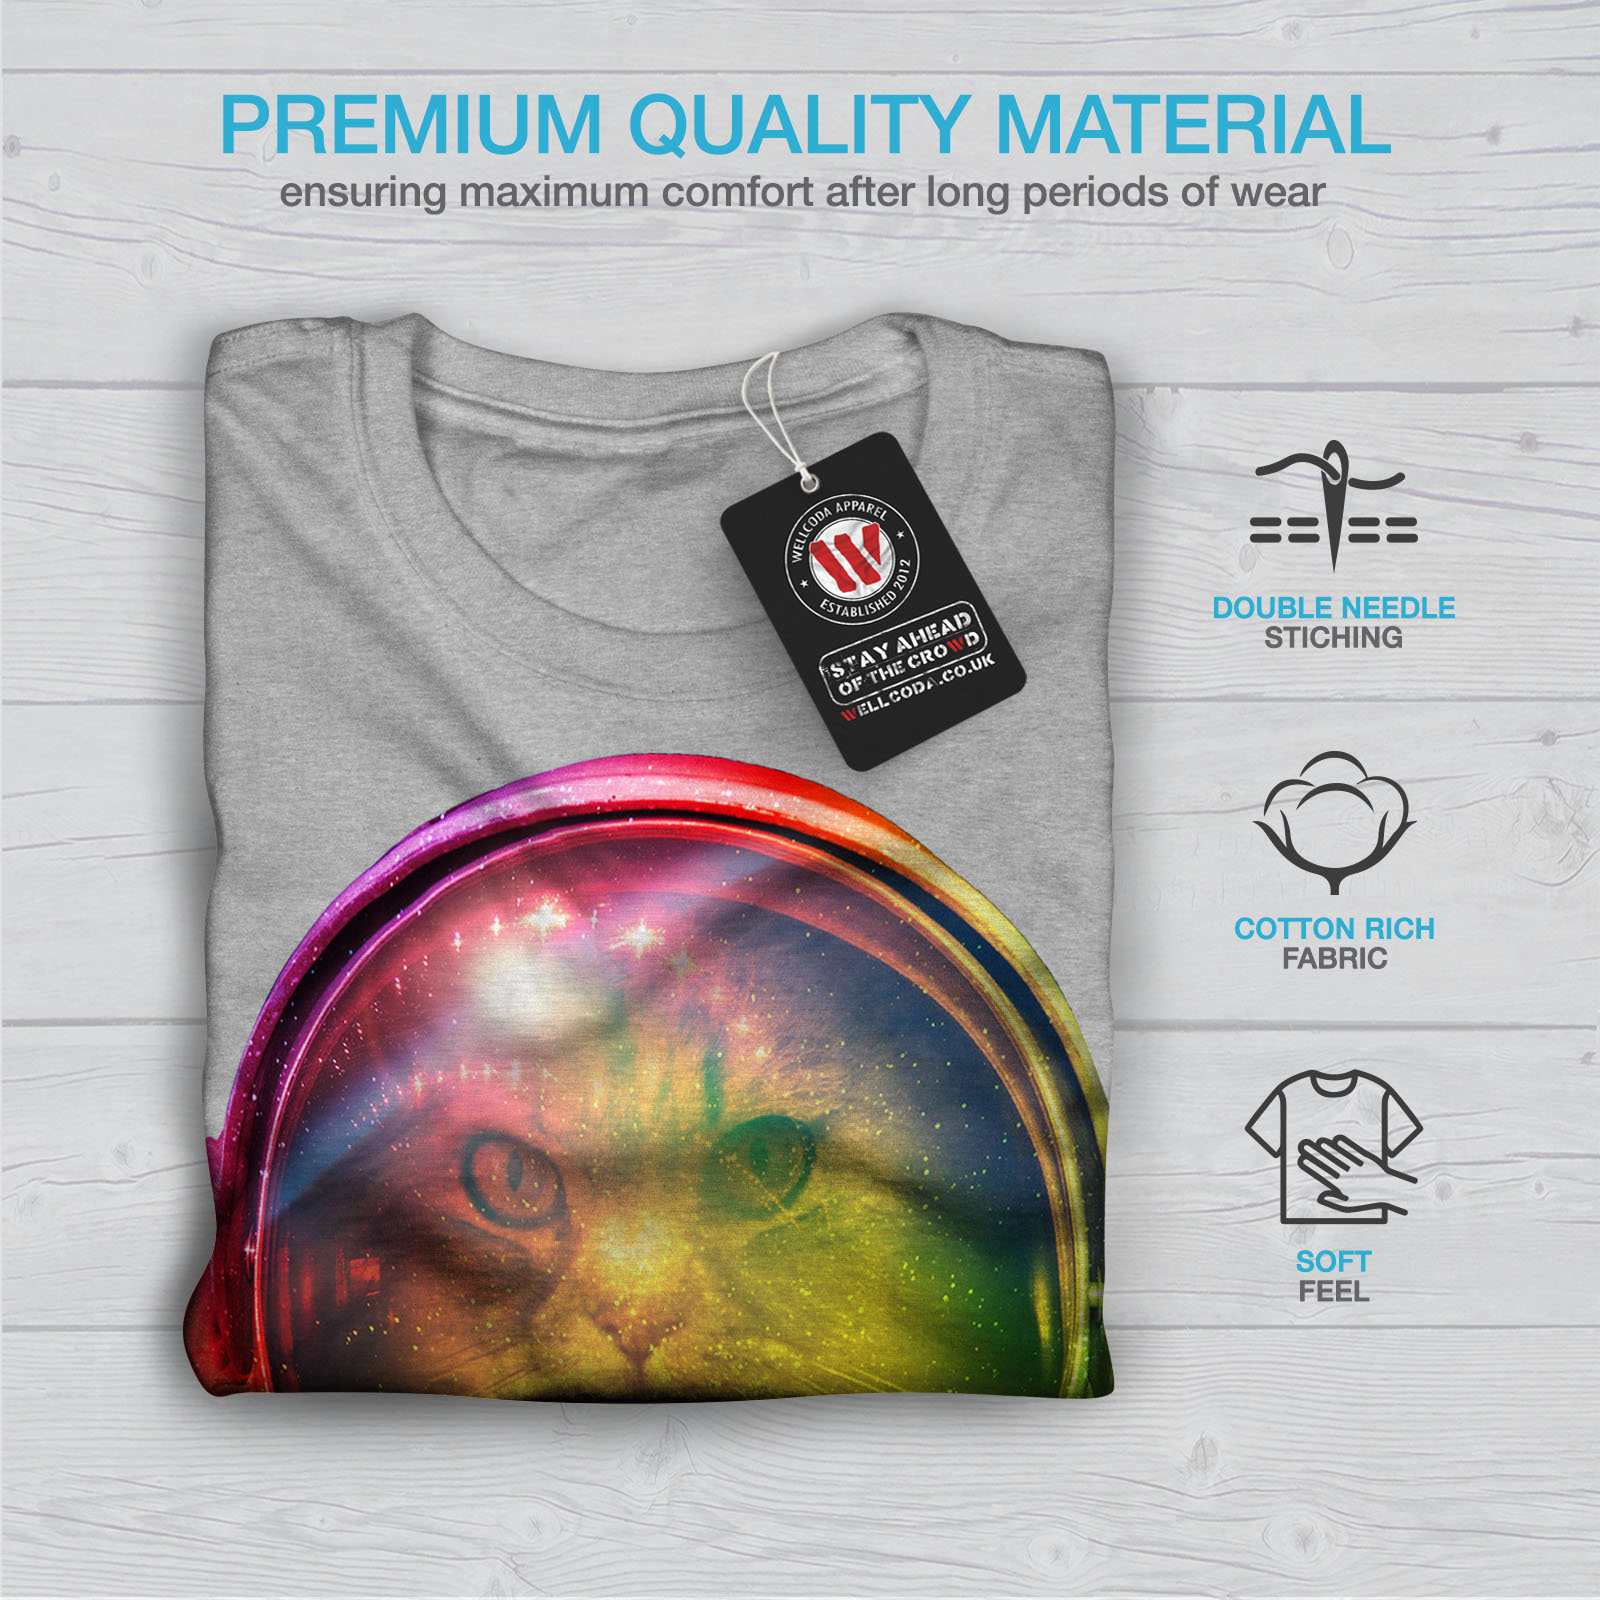 BOLF Mens T-Shirt Tee Short Sleeve Crew Neck Shirt Casual Print 3C3 Graphic